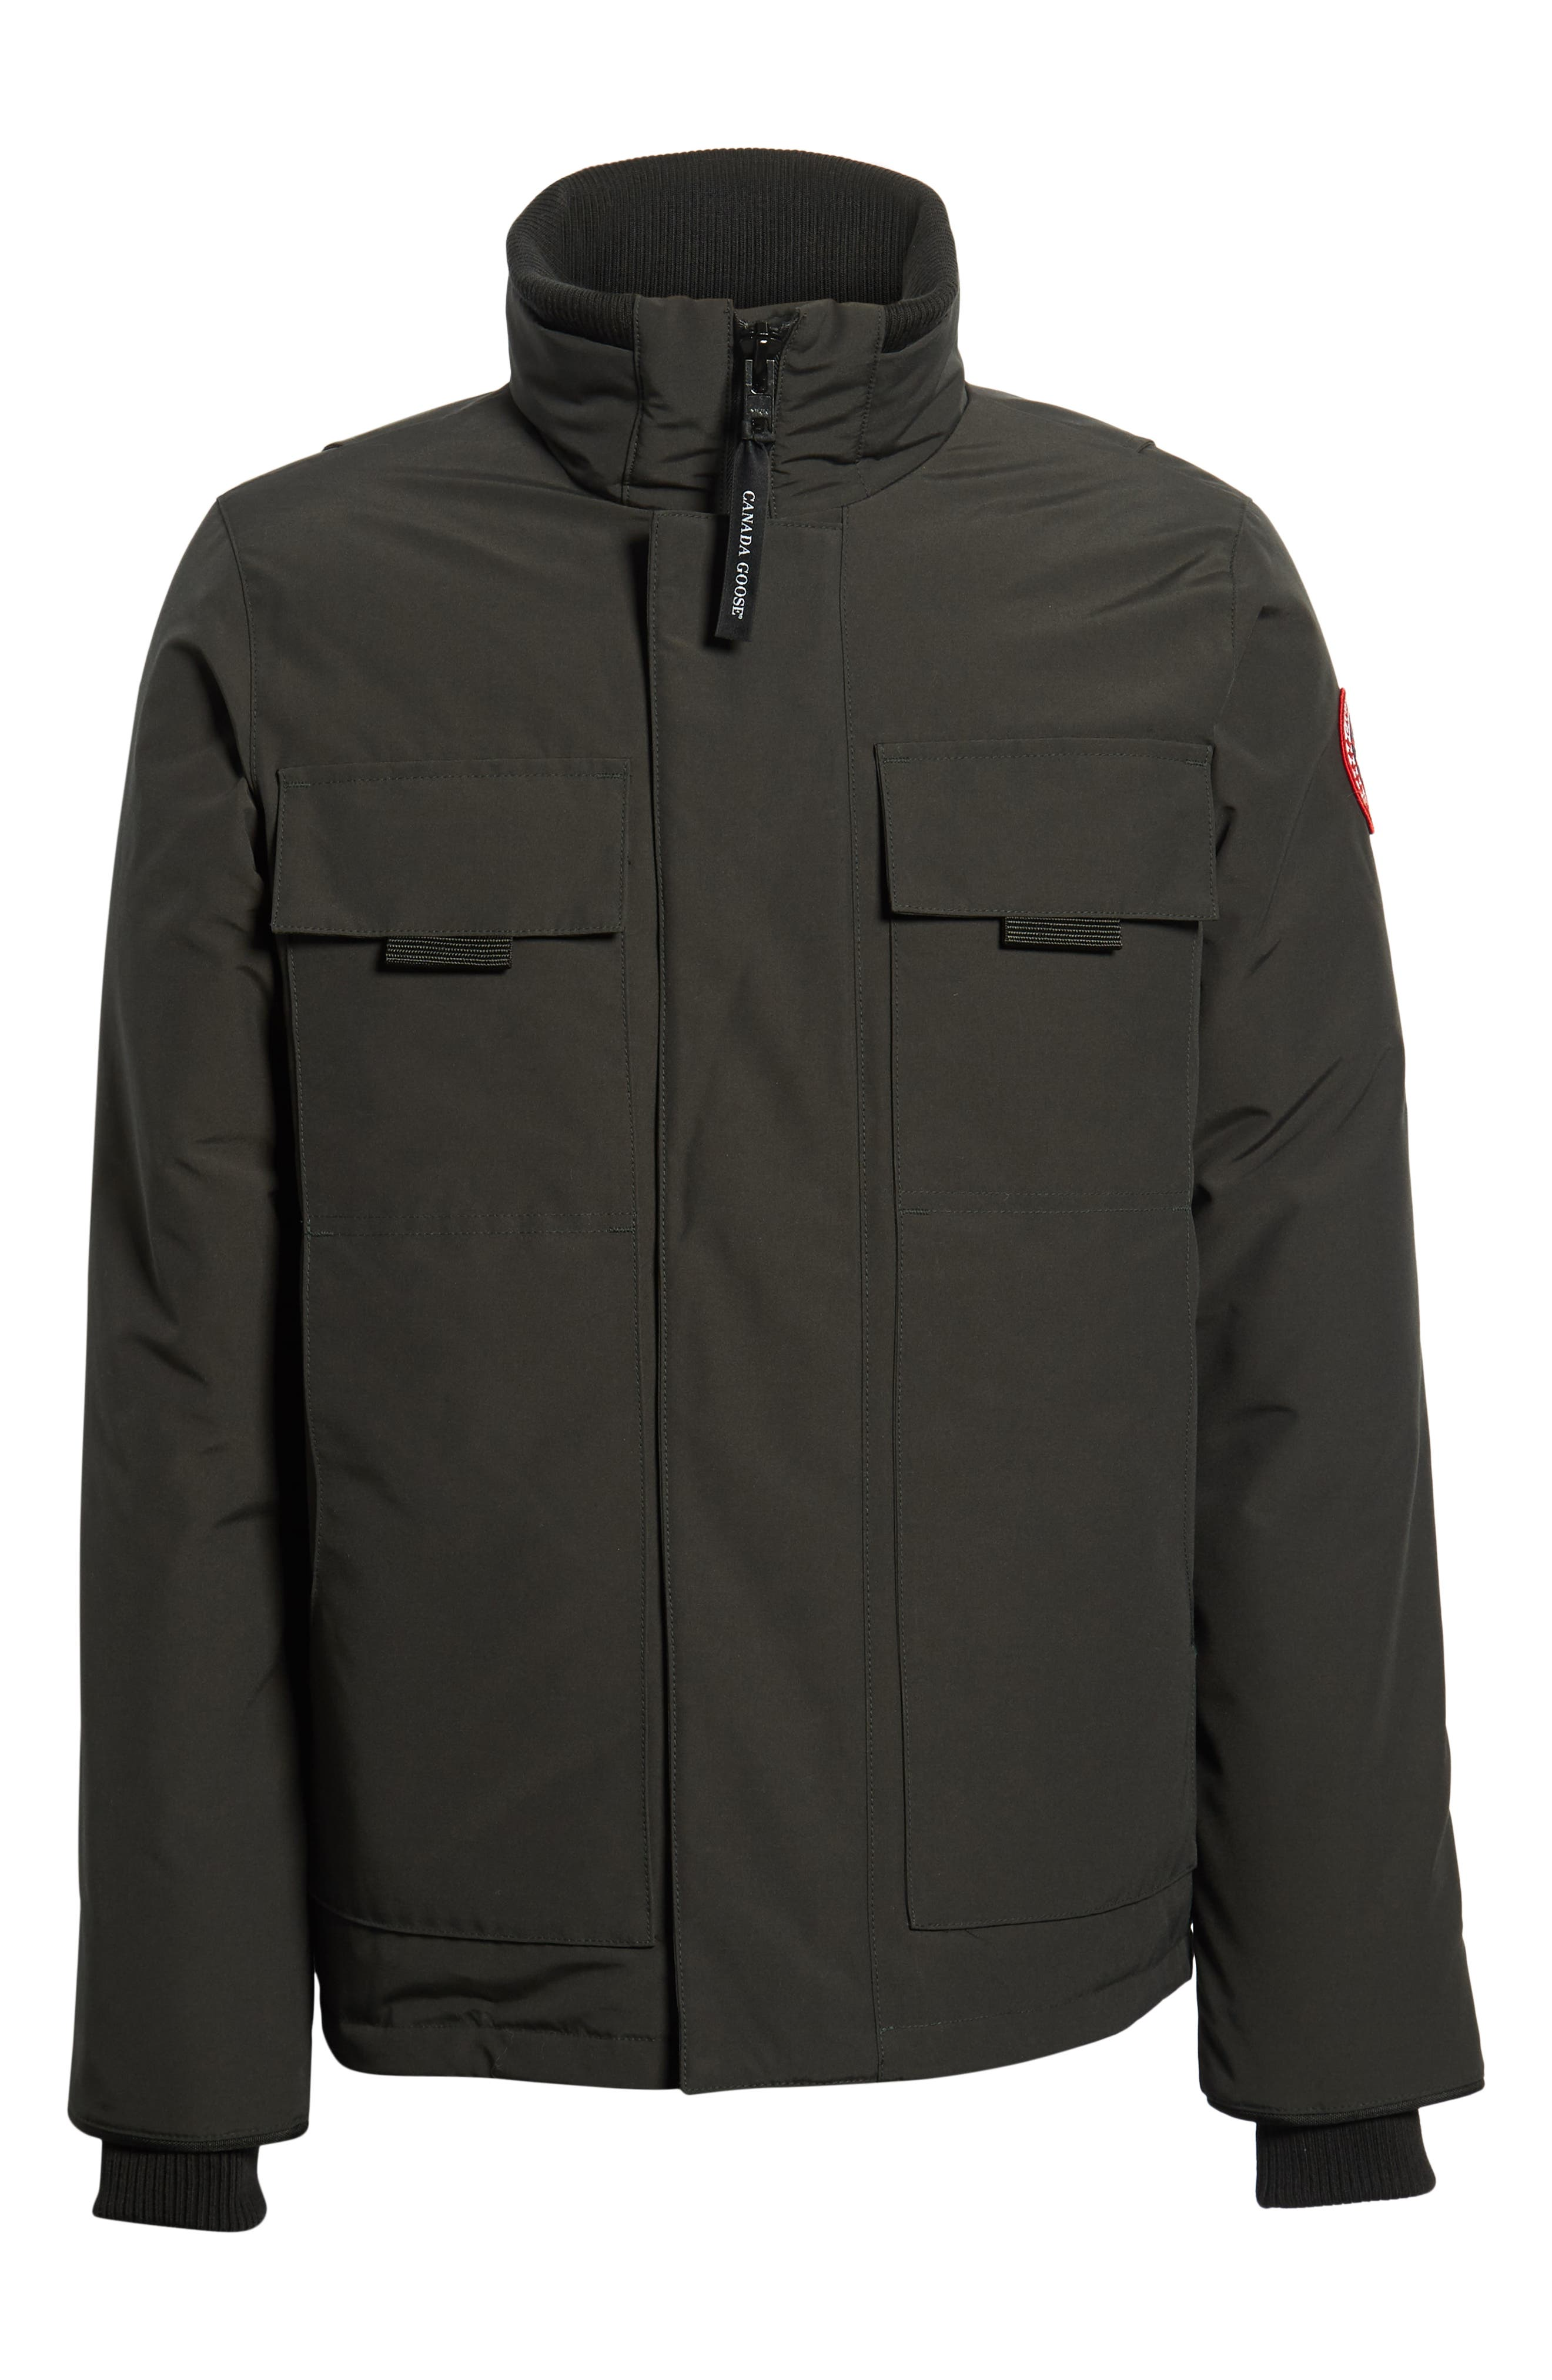 CANADA GOOSE,                             Forester Slim Fit Jacket,                             Alternate thumbnail 6, color,                             BLACK